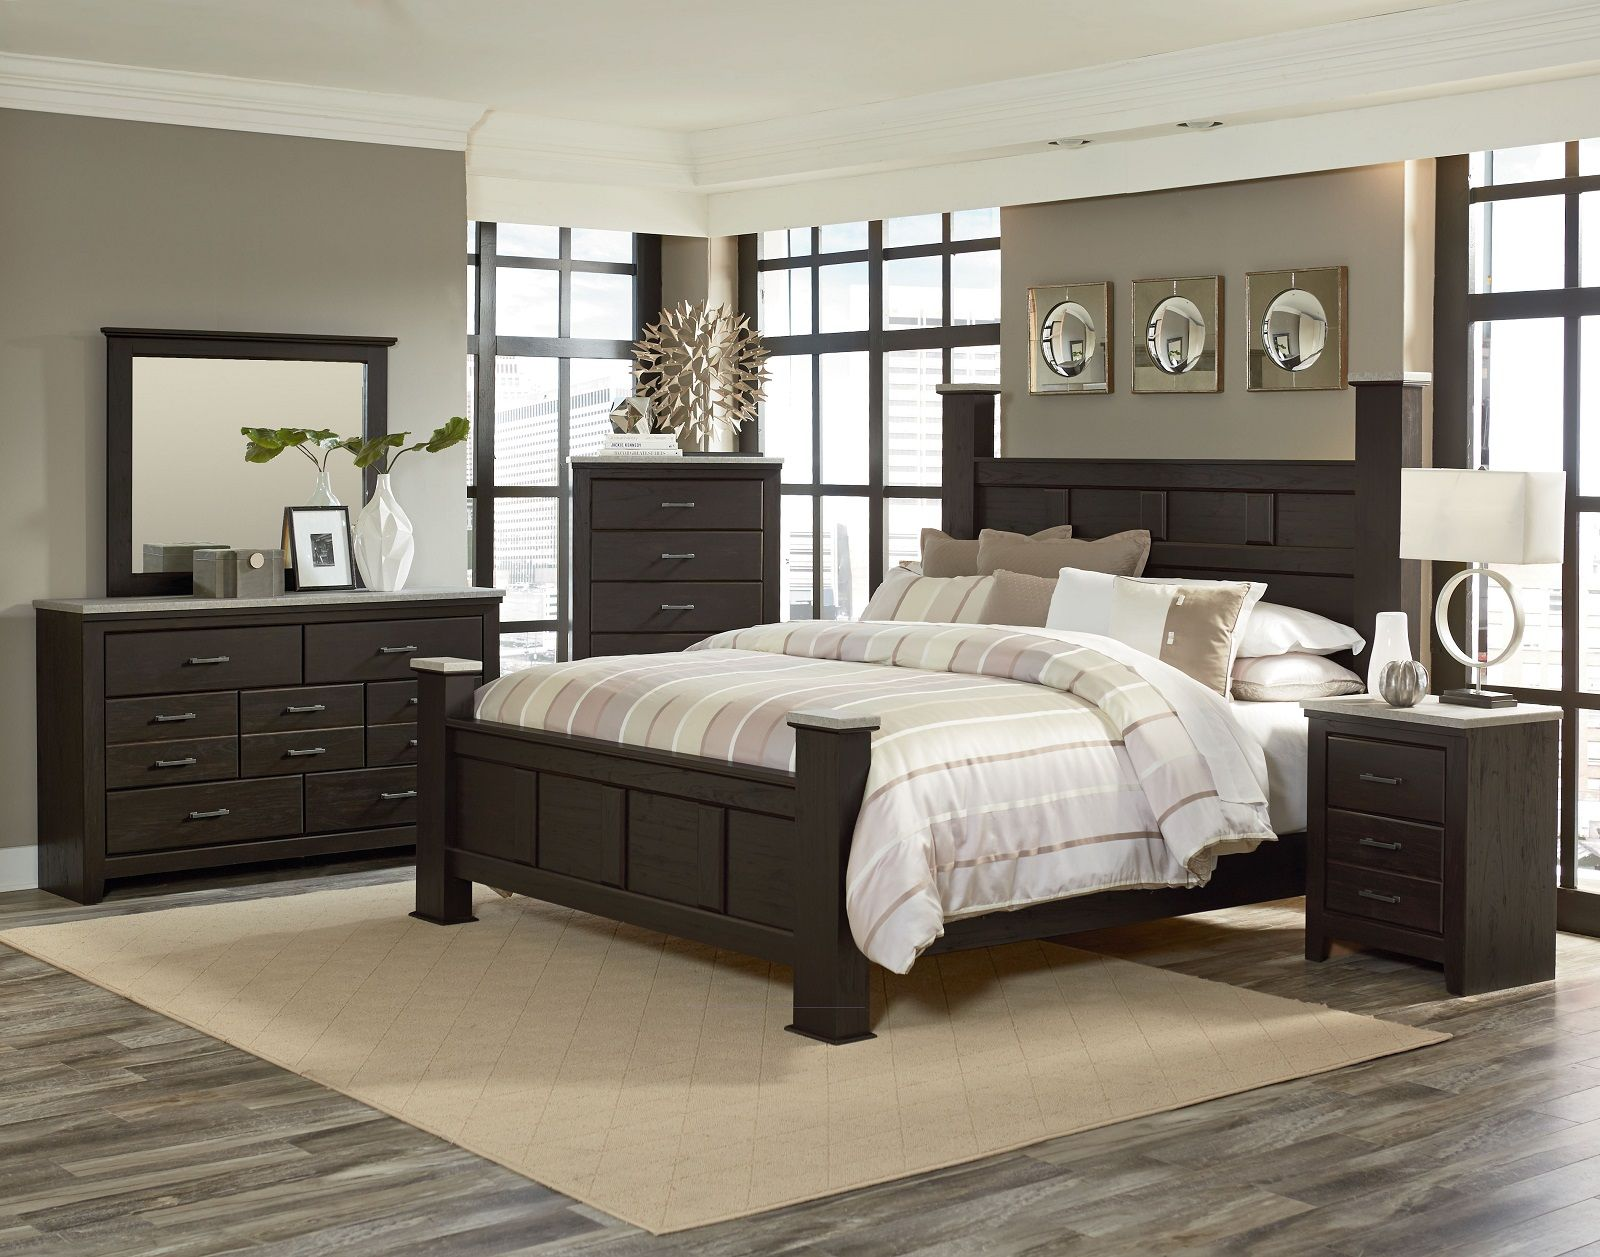 Standard Furniture Stonehill 4Piece Poster Bedroom Set in